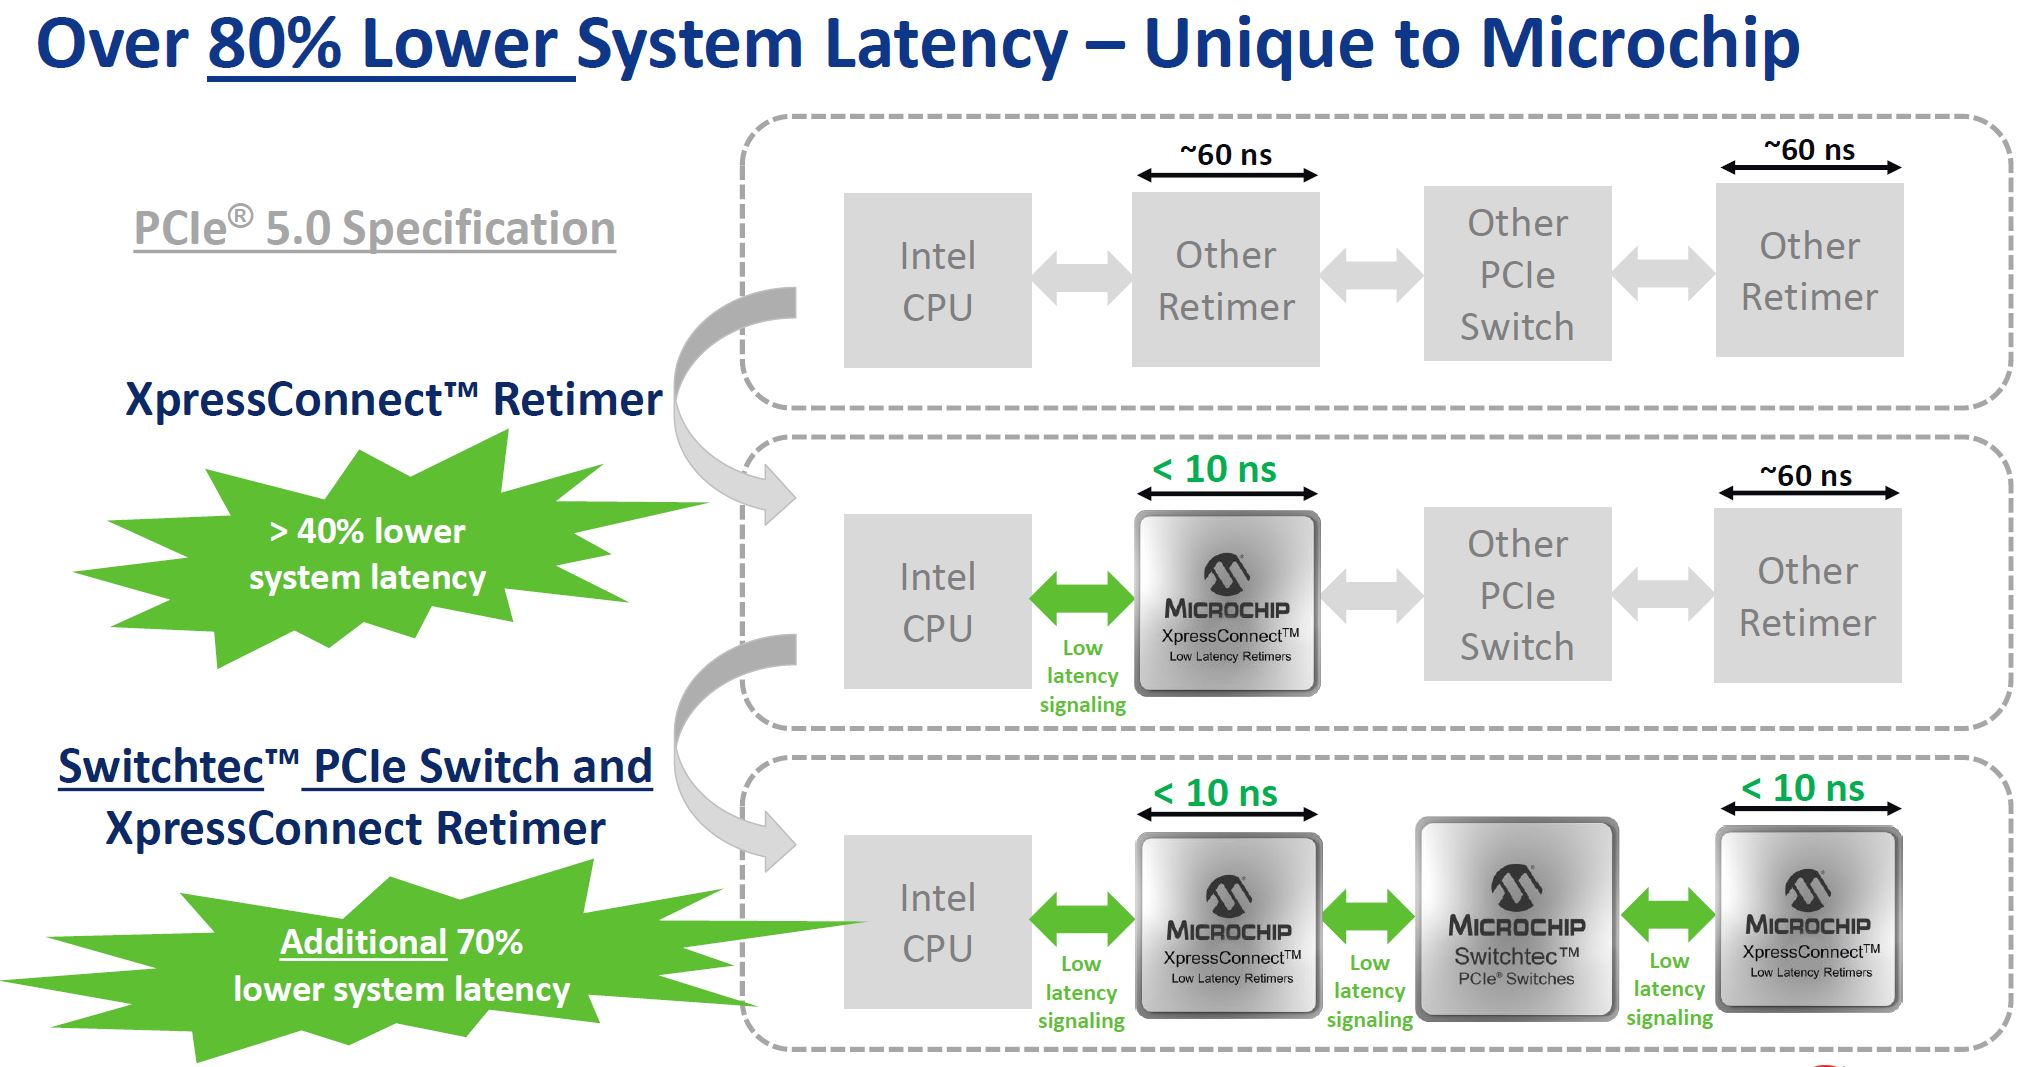 Microchip Switchtec PCIe 5.0 Switch Lower Latency